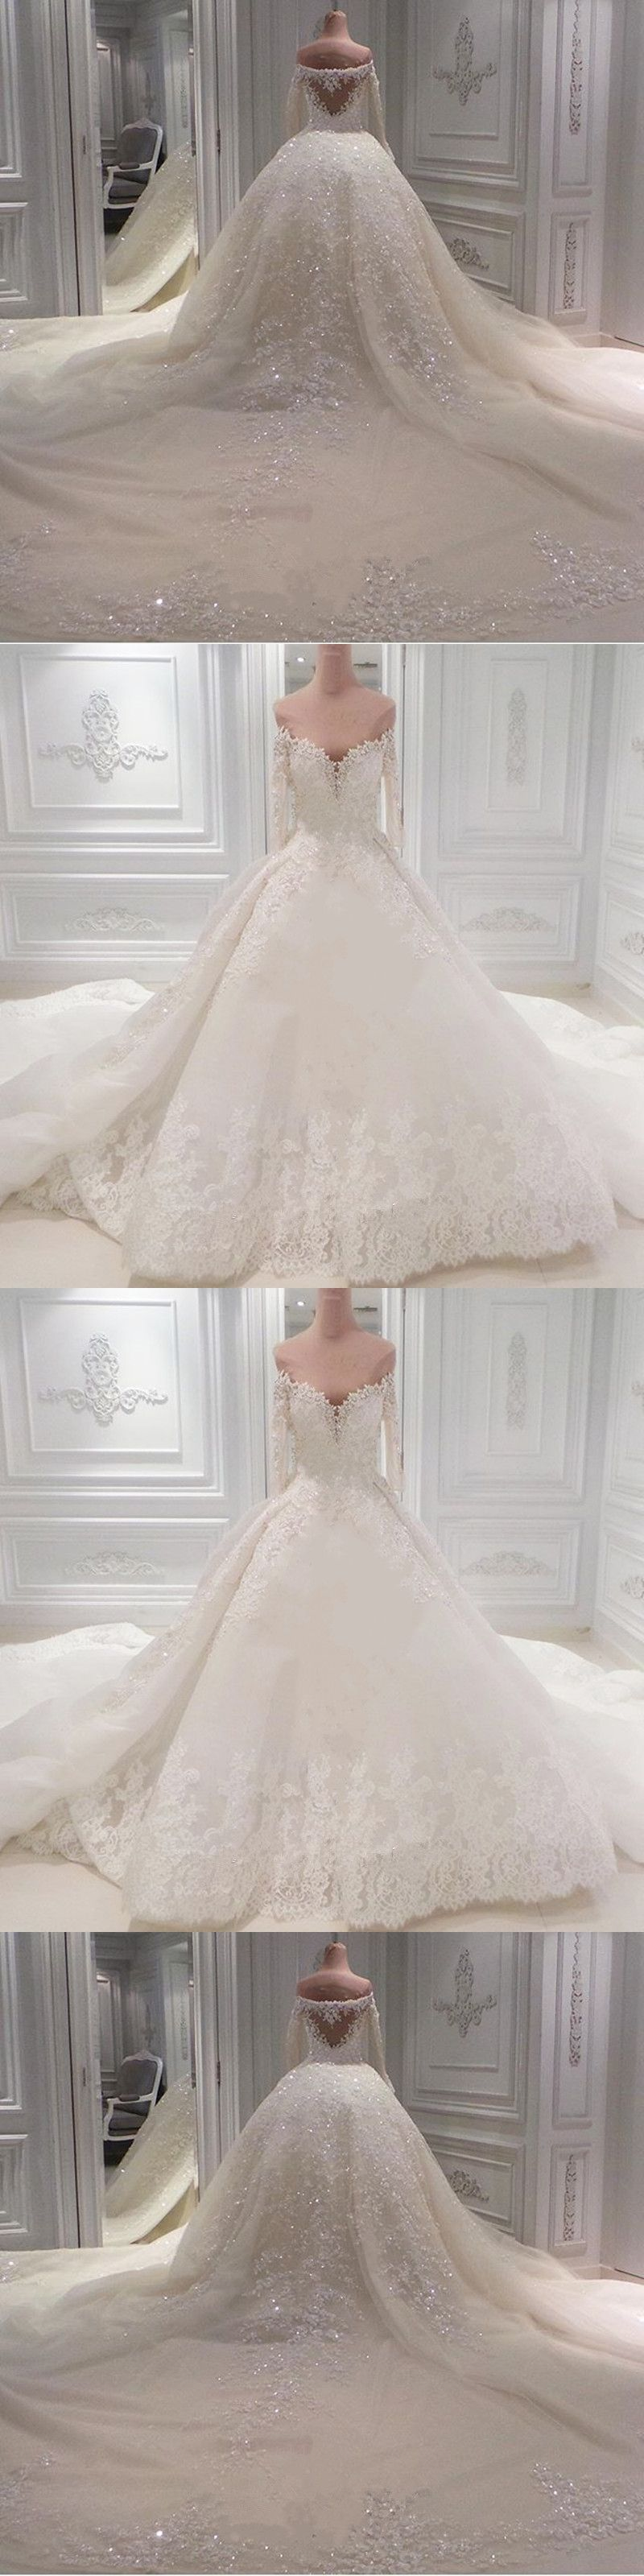 exquisite wedding dresses sweetheart long sleeves beaded bridal